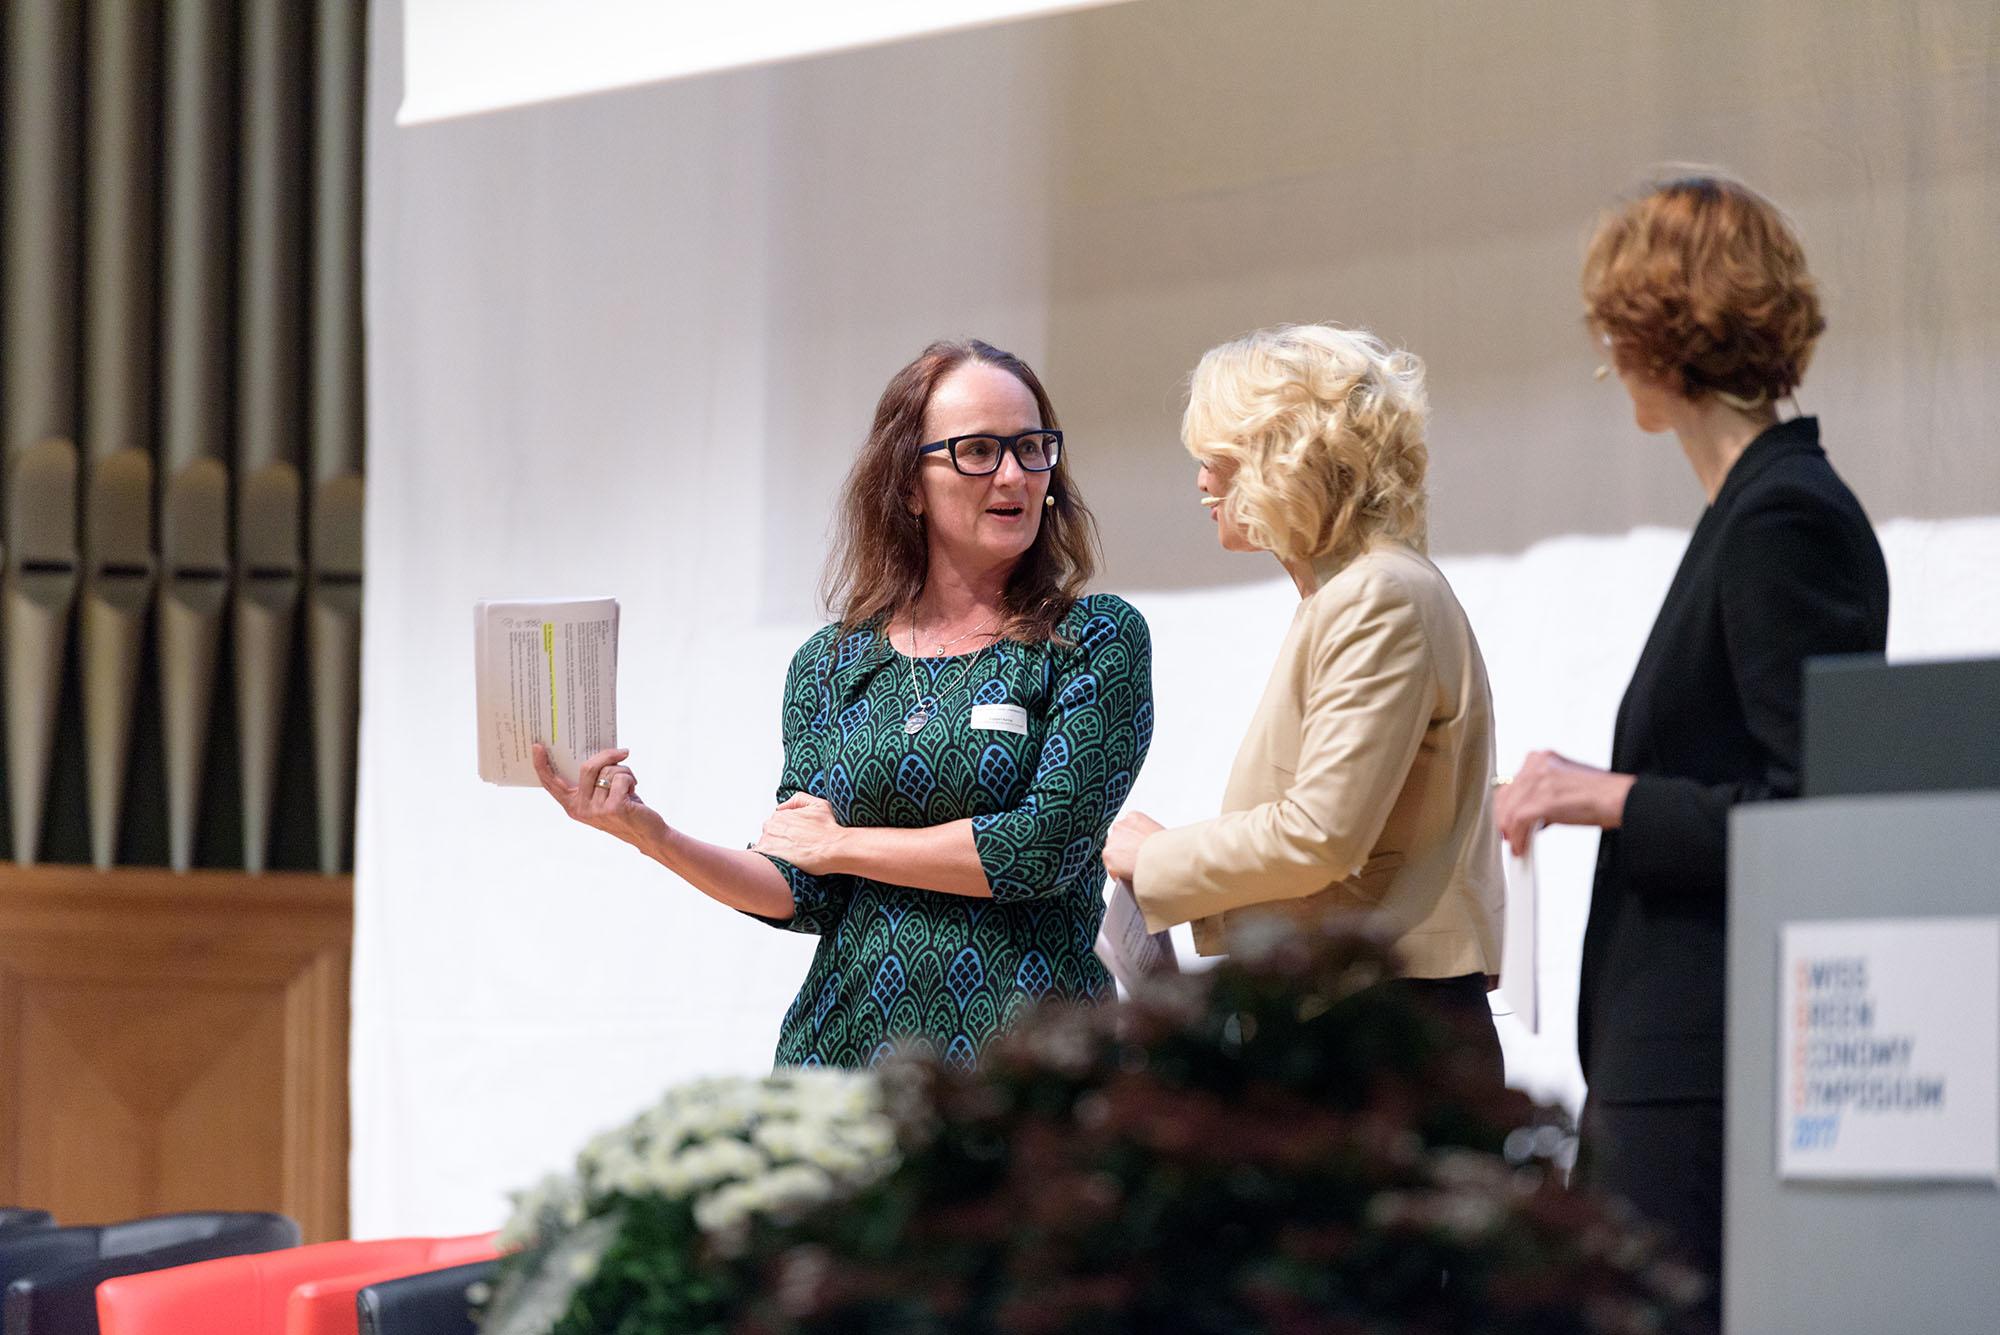 Karine Siegwart, Sonja Hasler, Monika Rühl